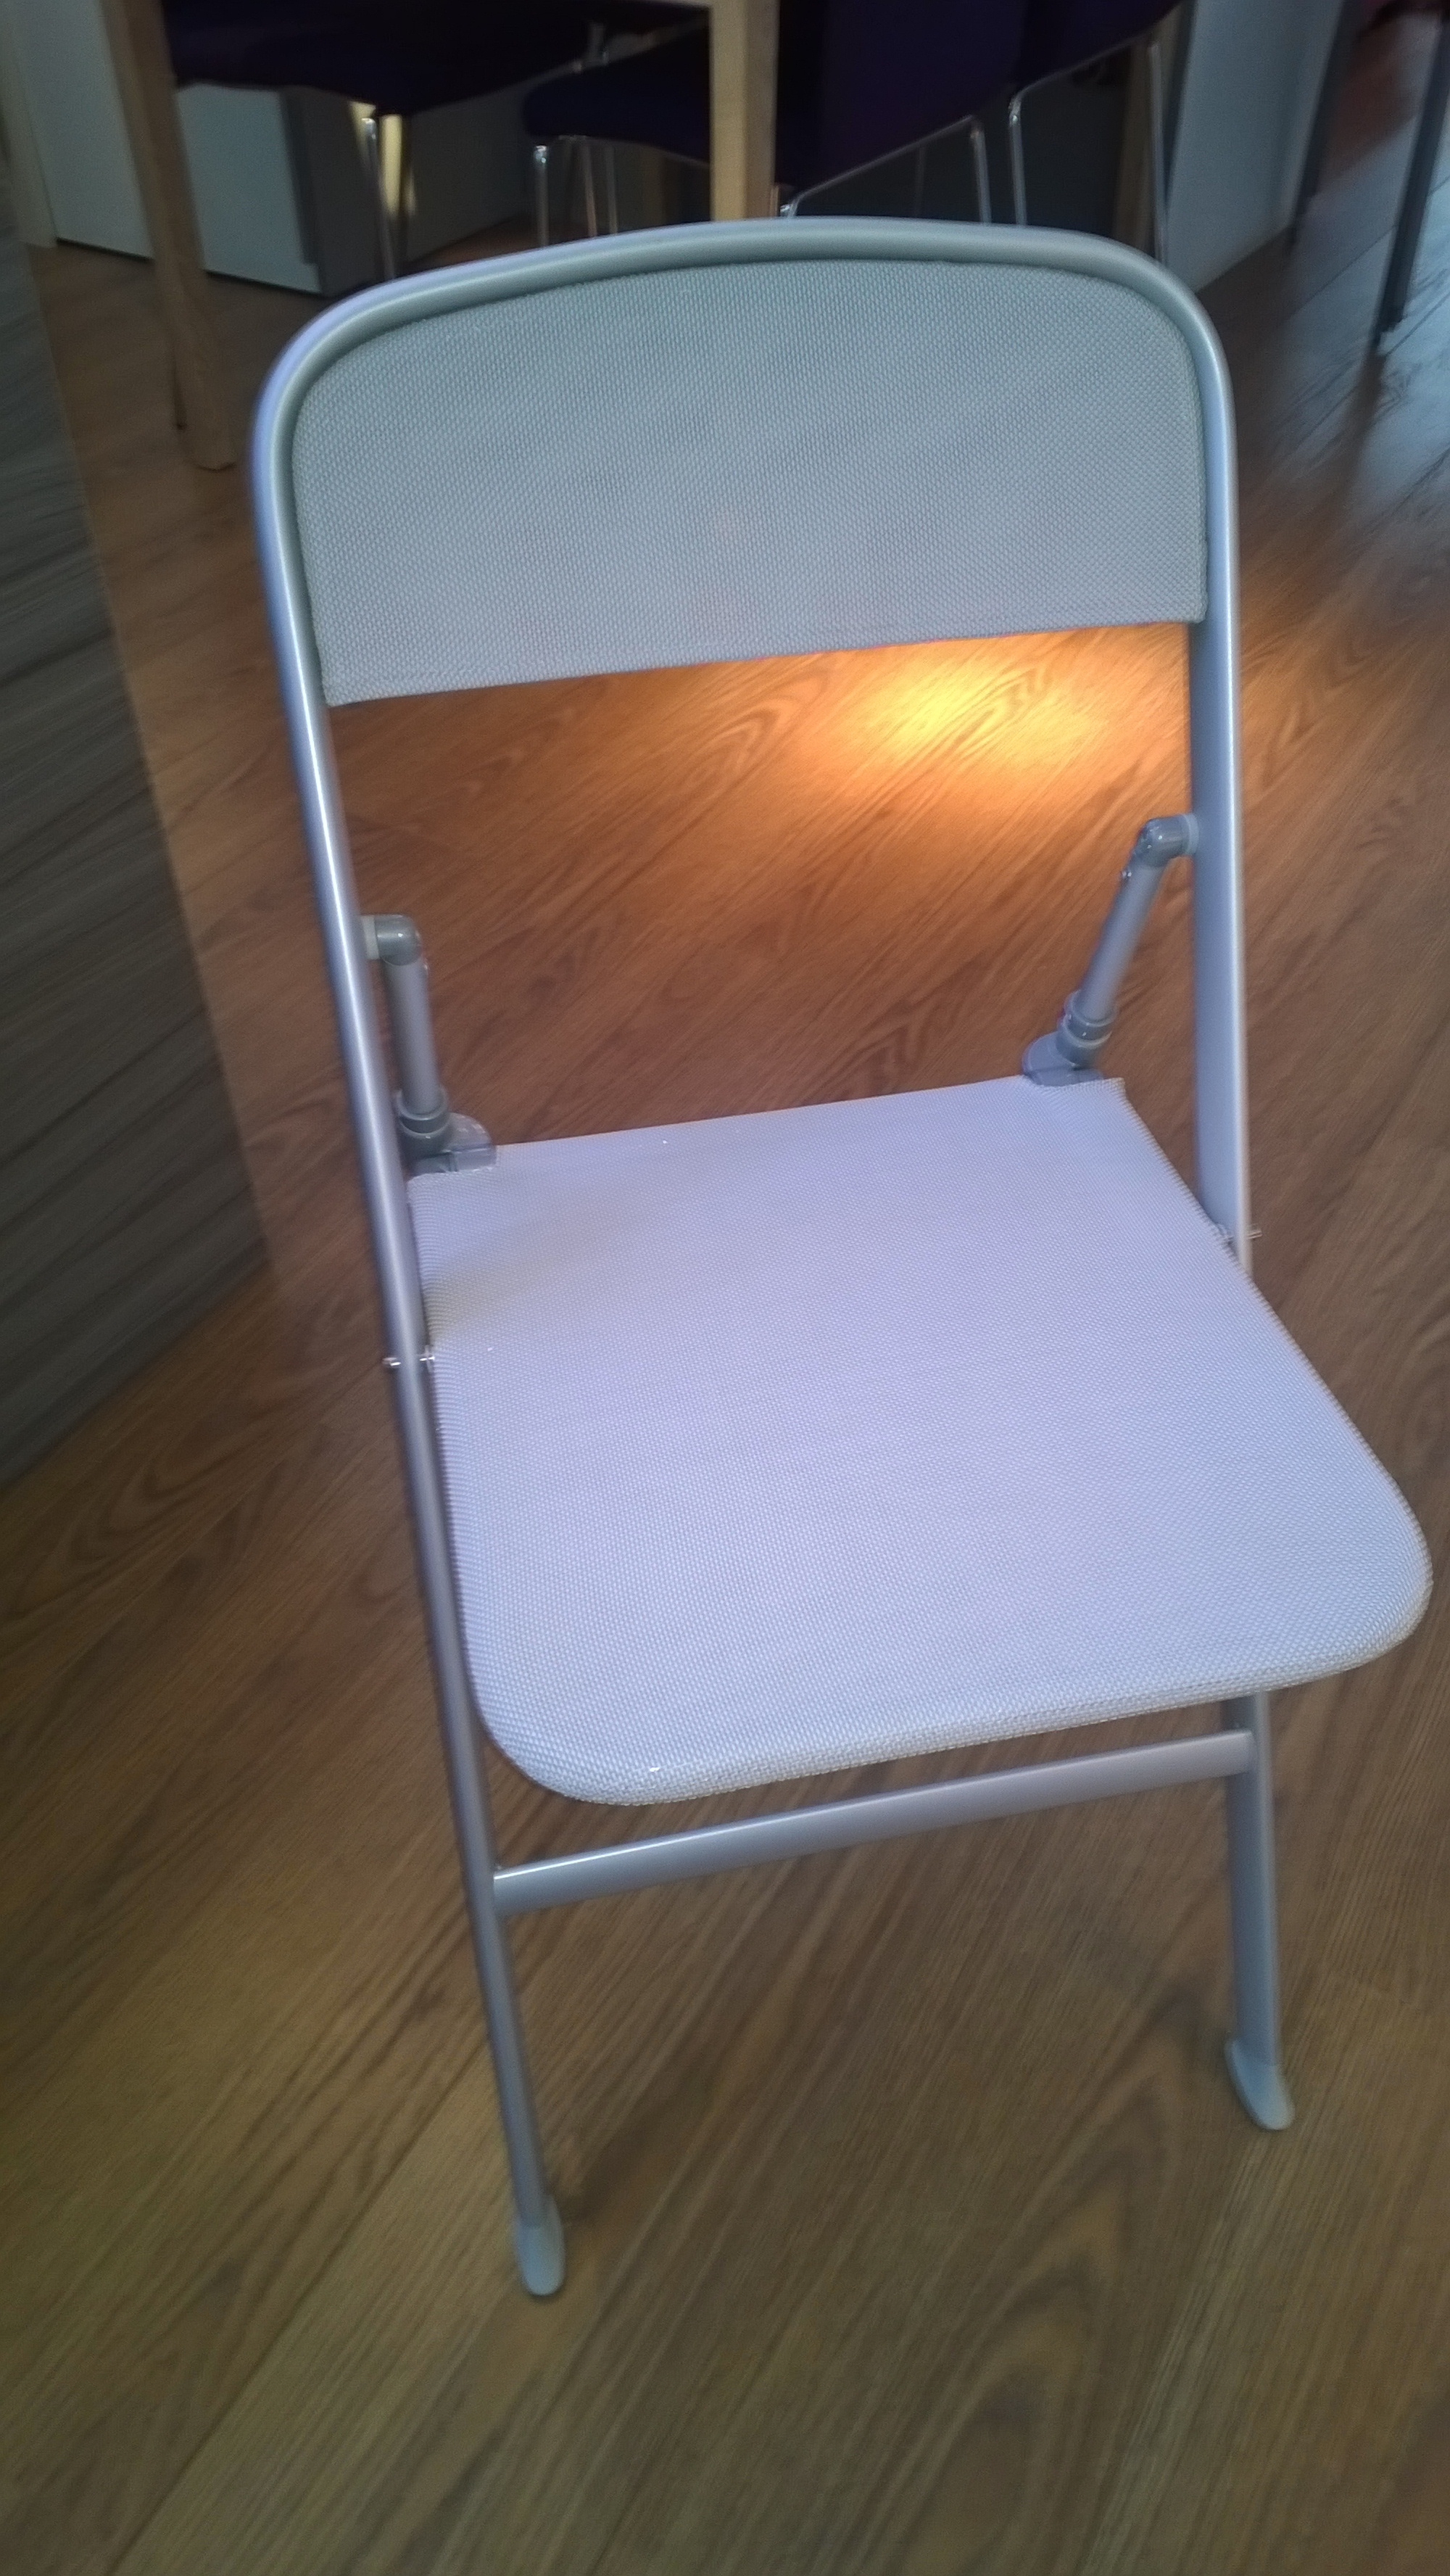 Sedia skip calligaris prezzo interesting set sedie - Tavolo olivia calligaris prezzo ...